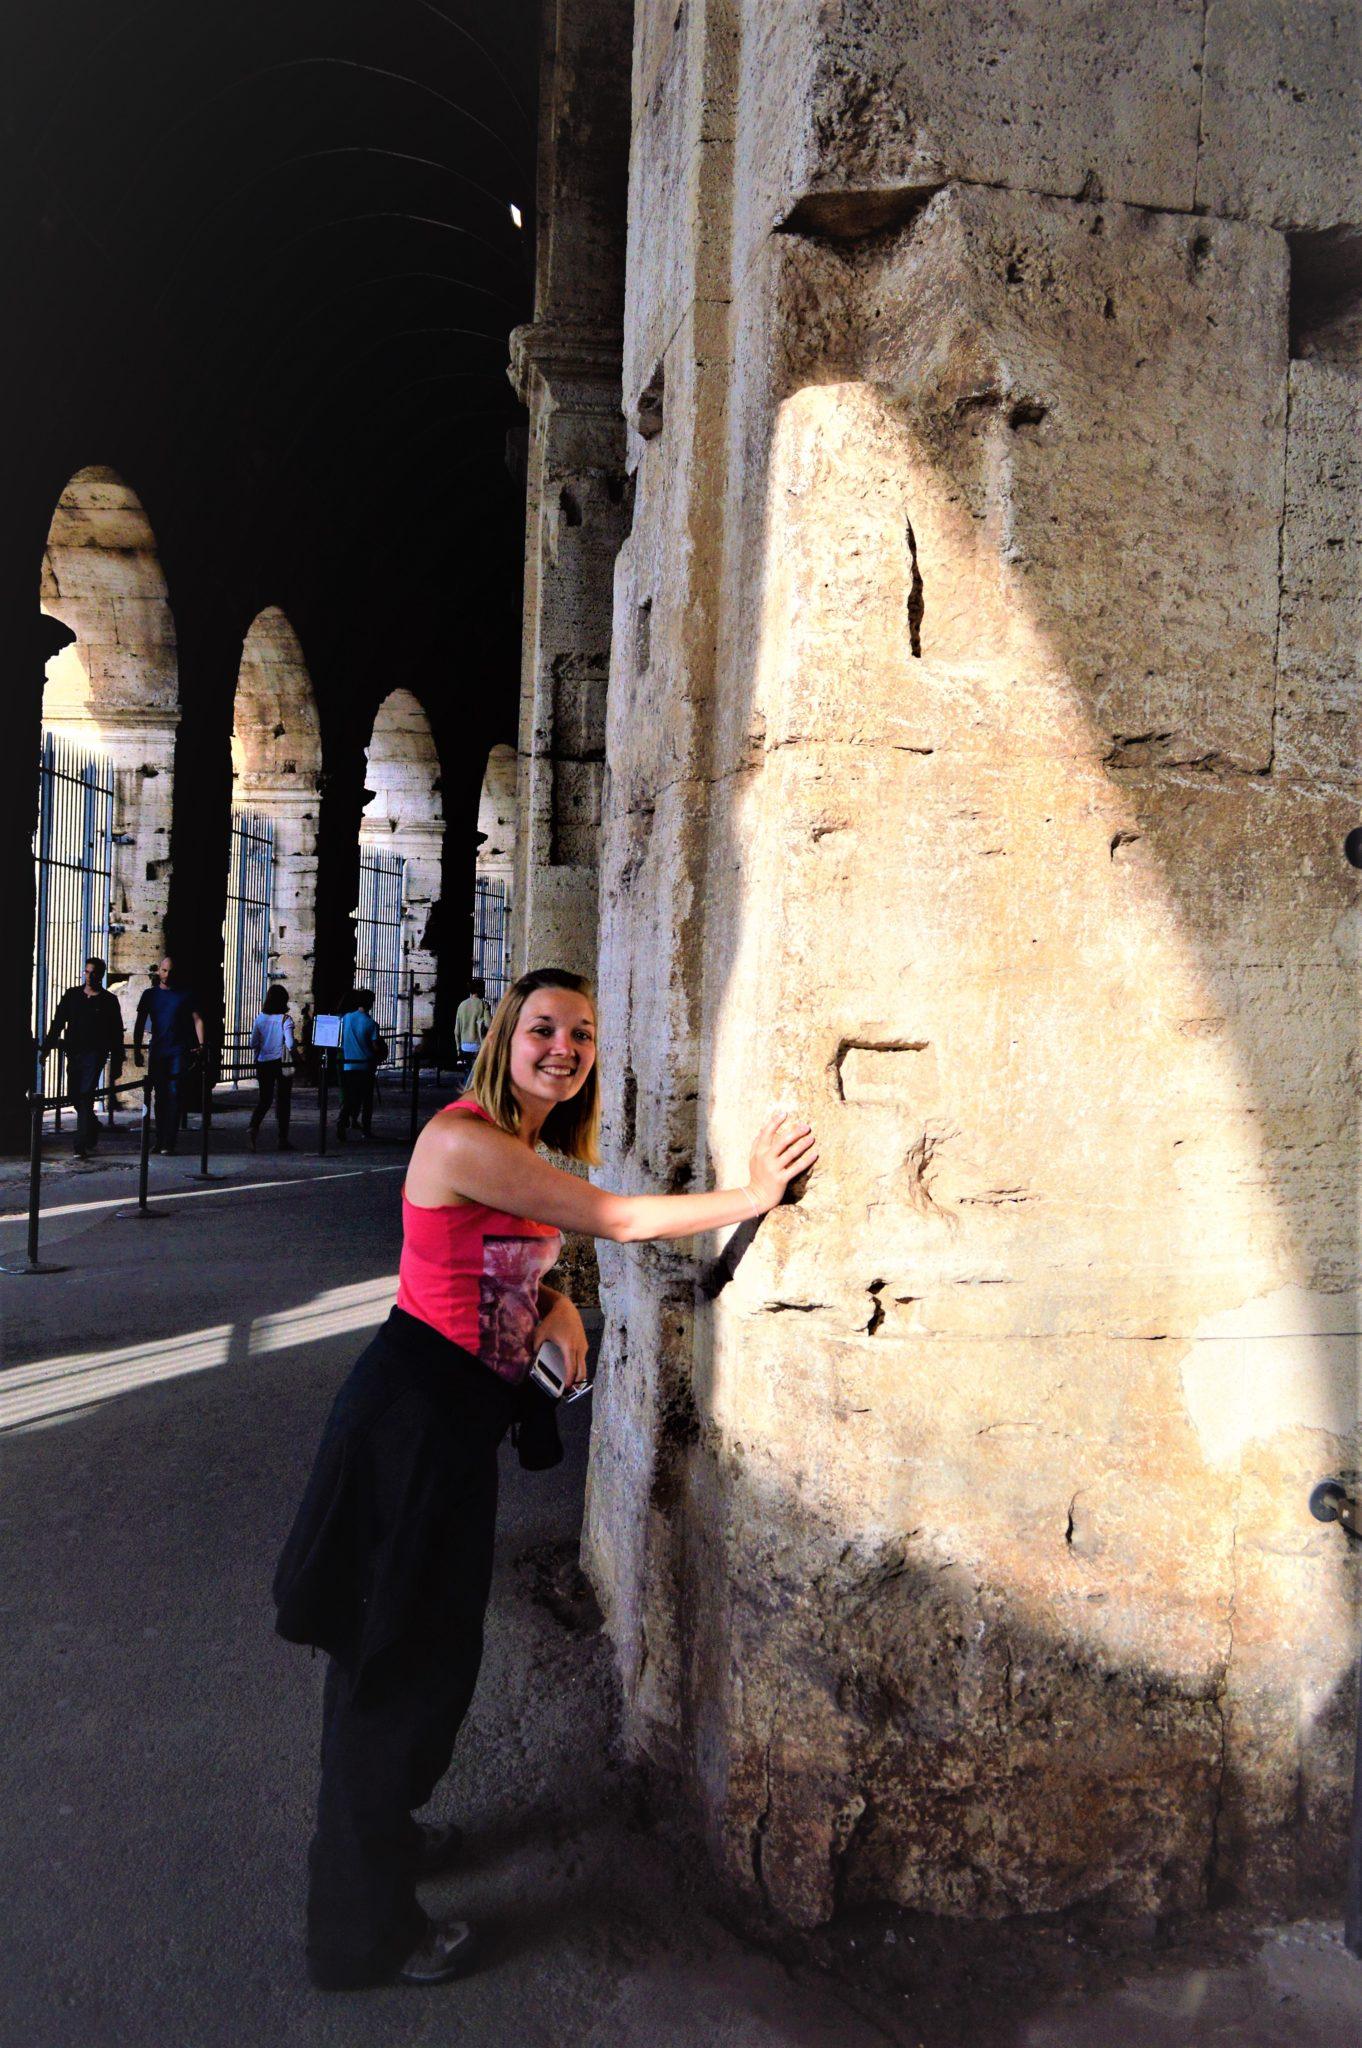 Stone inside the Roman Colosseum, Rome, Italy